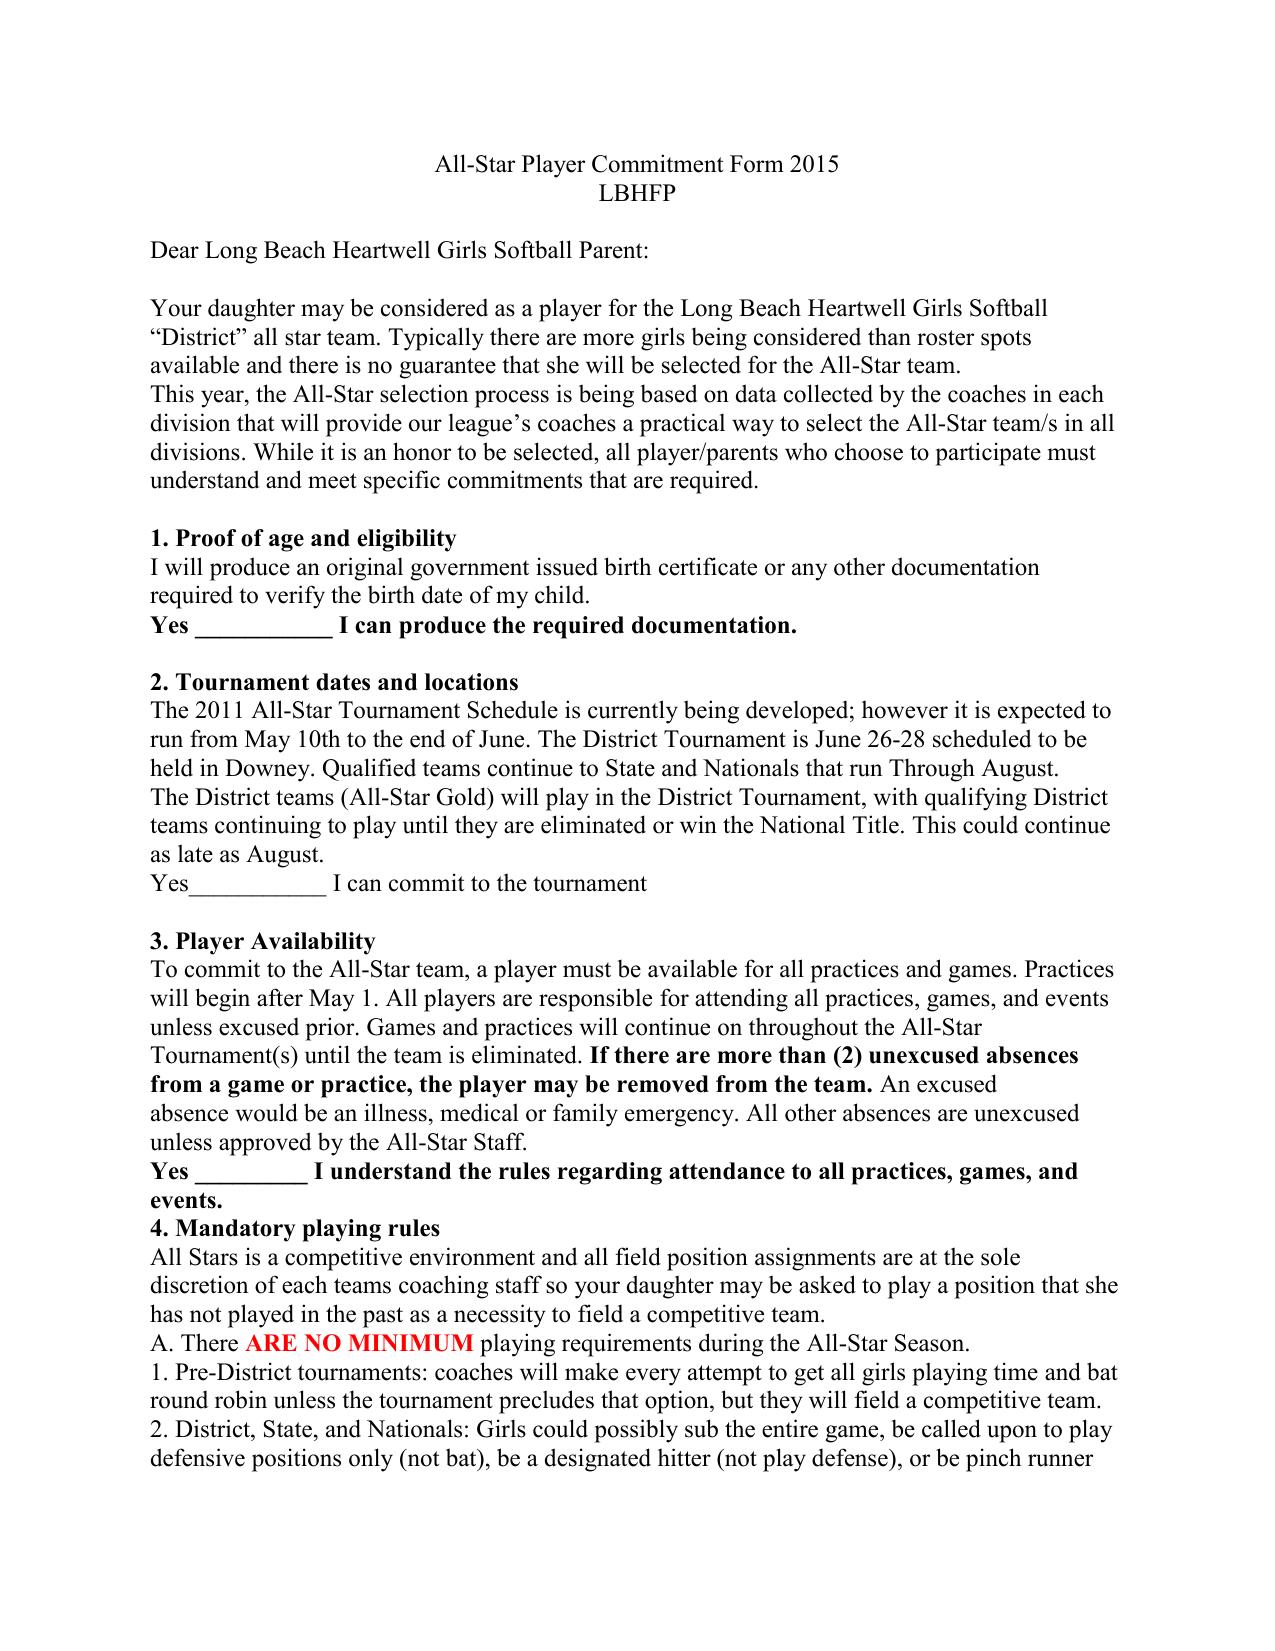 All Star Player Commitment Form 2015 Lbhfp Dear Long Beach